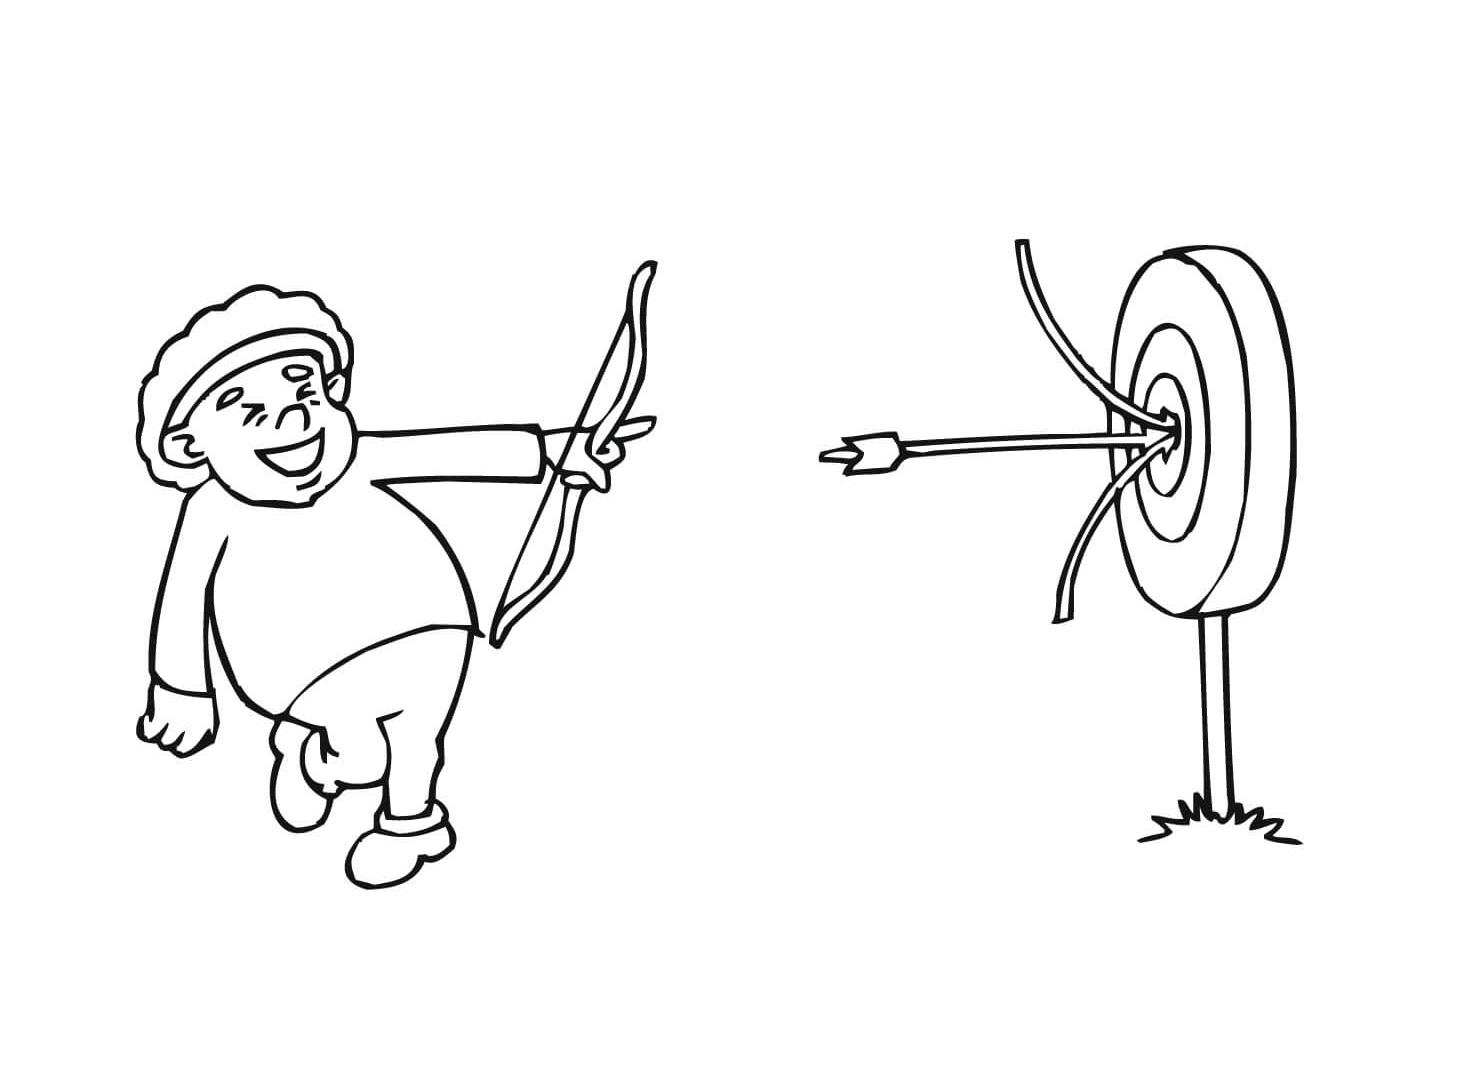 The Boy Shooting The Arrow